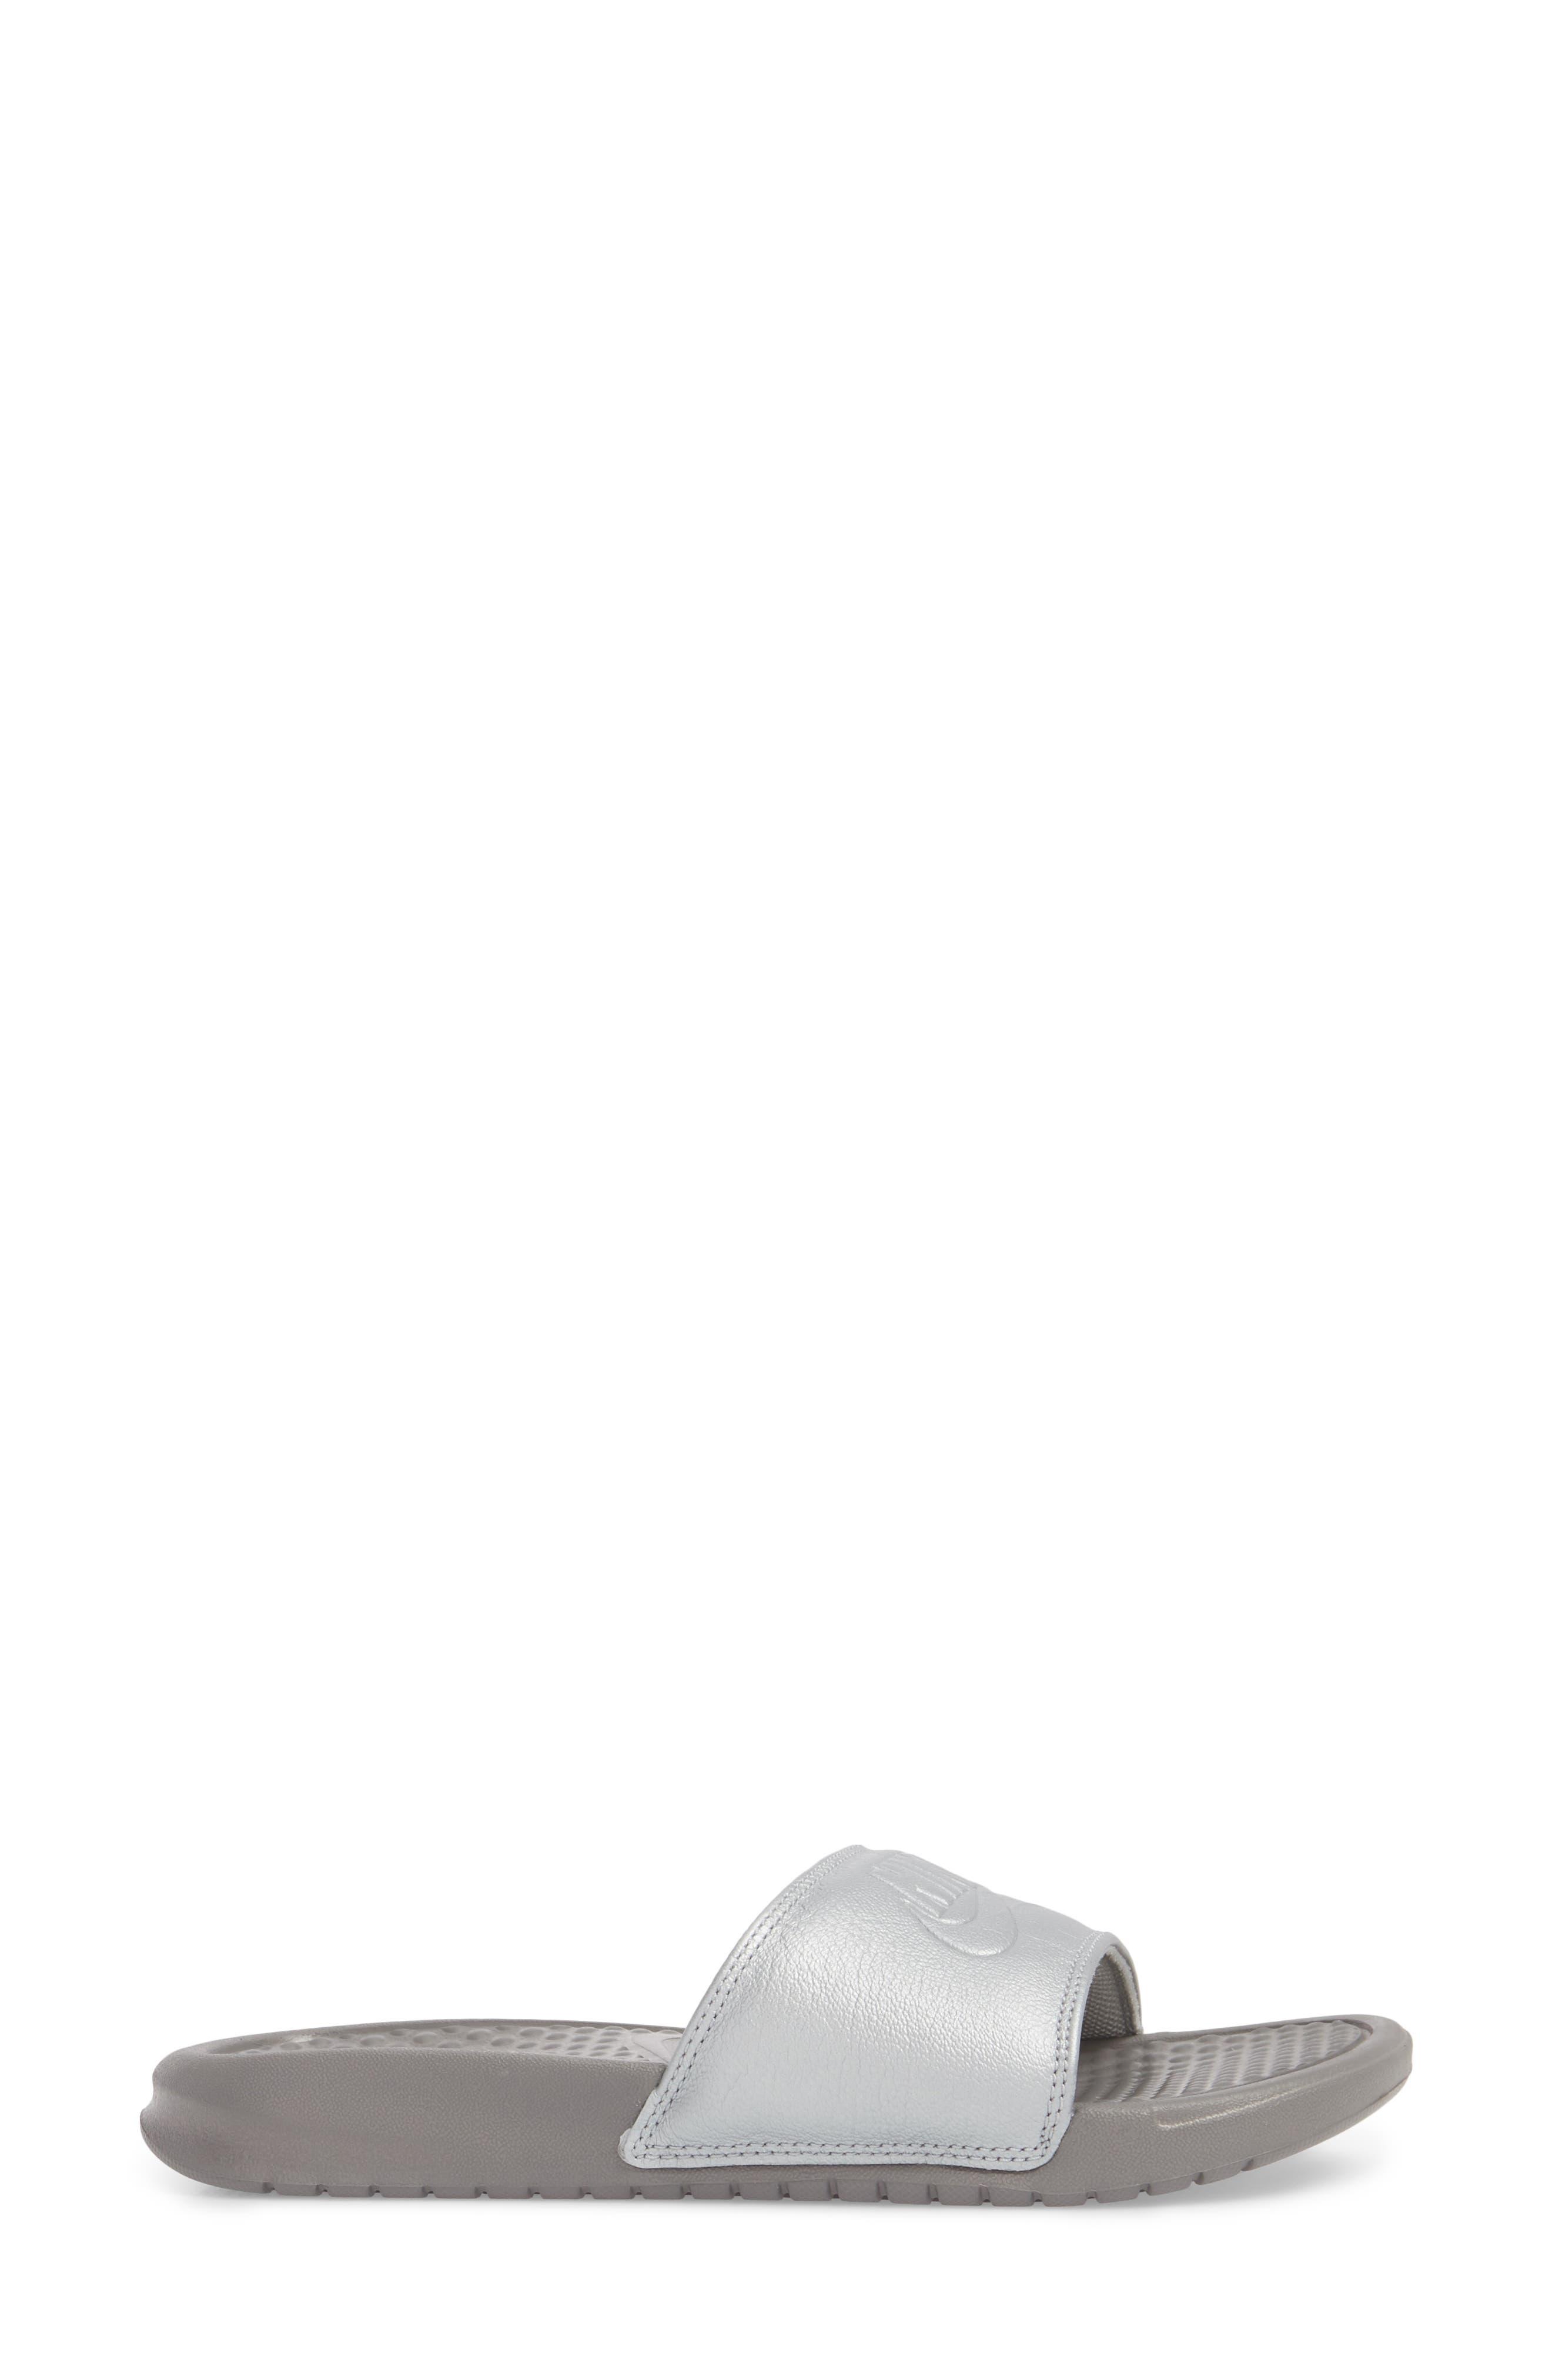 Benassi JDI Sport Slide,                             Alternate thumbnail 3, color,                             Metallic Silver